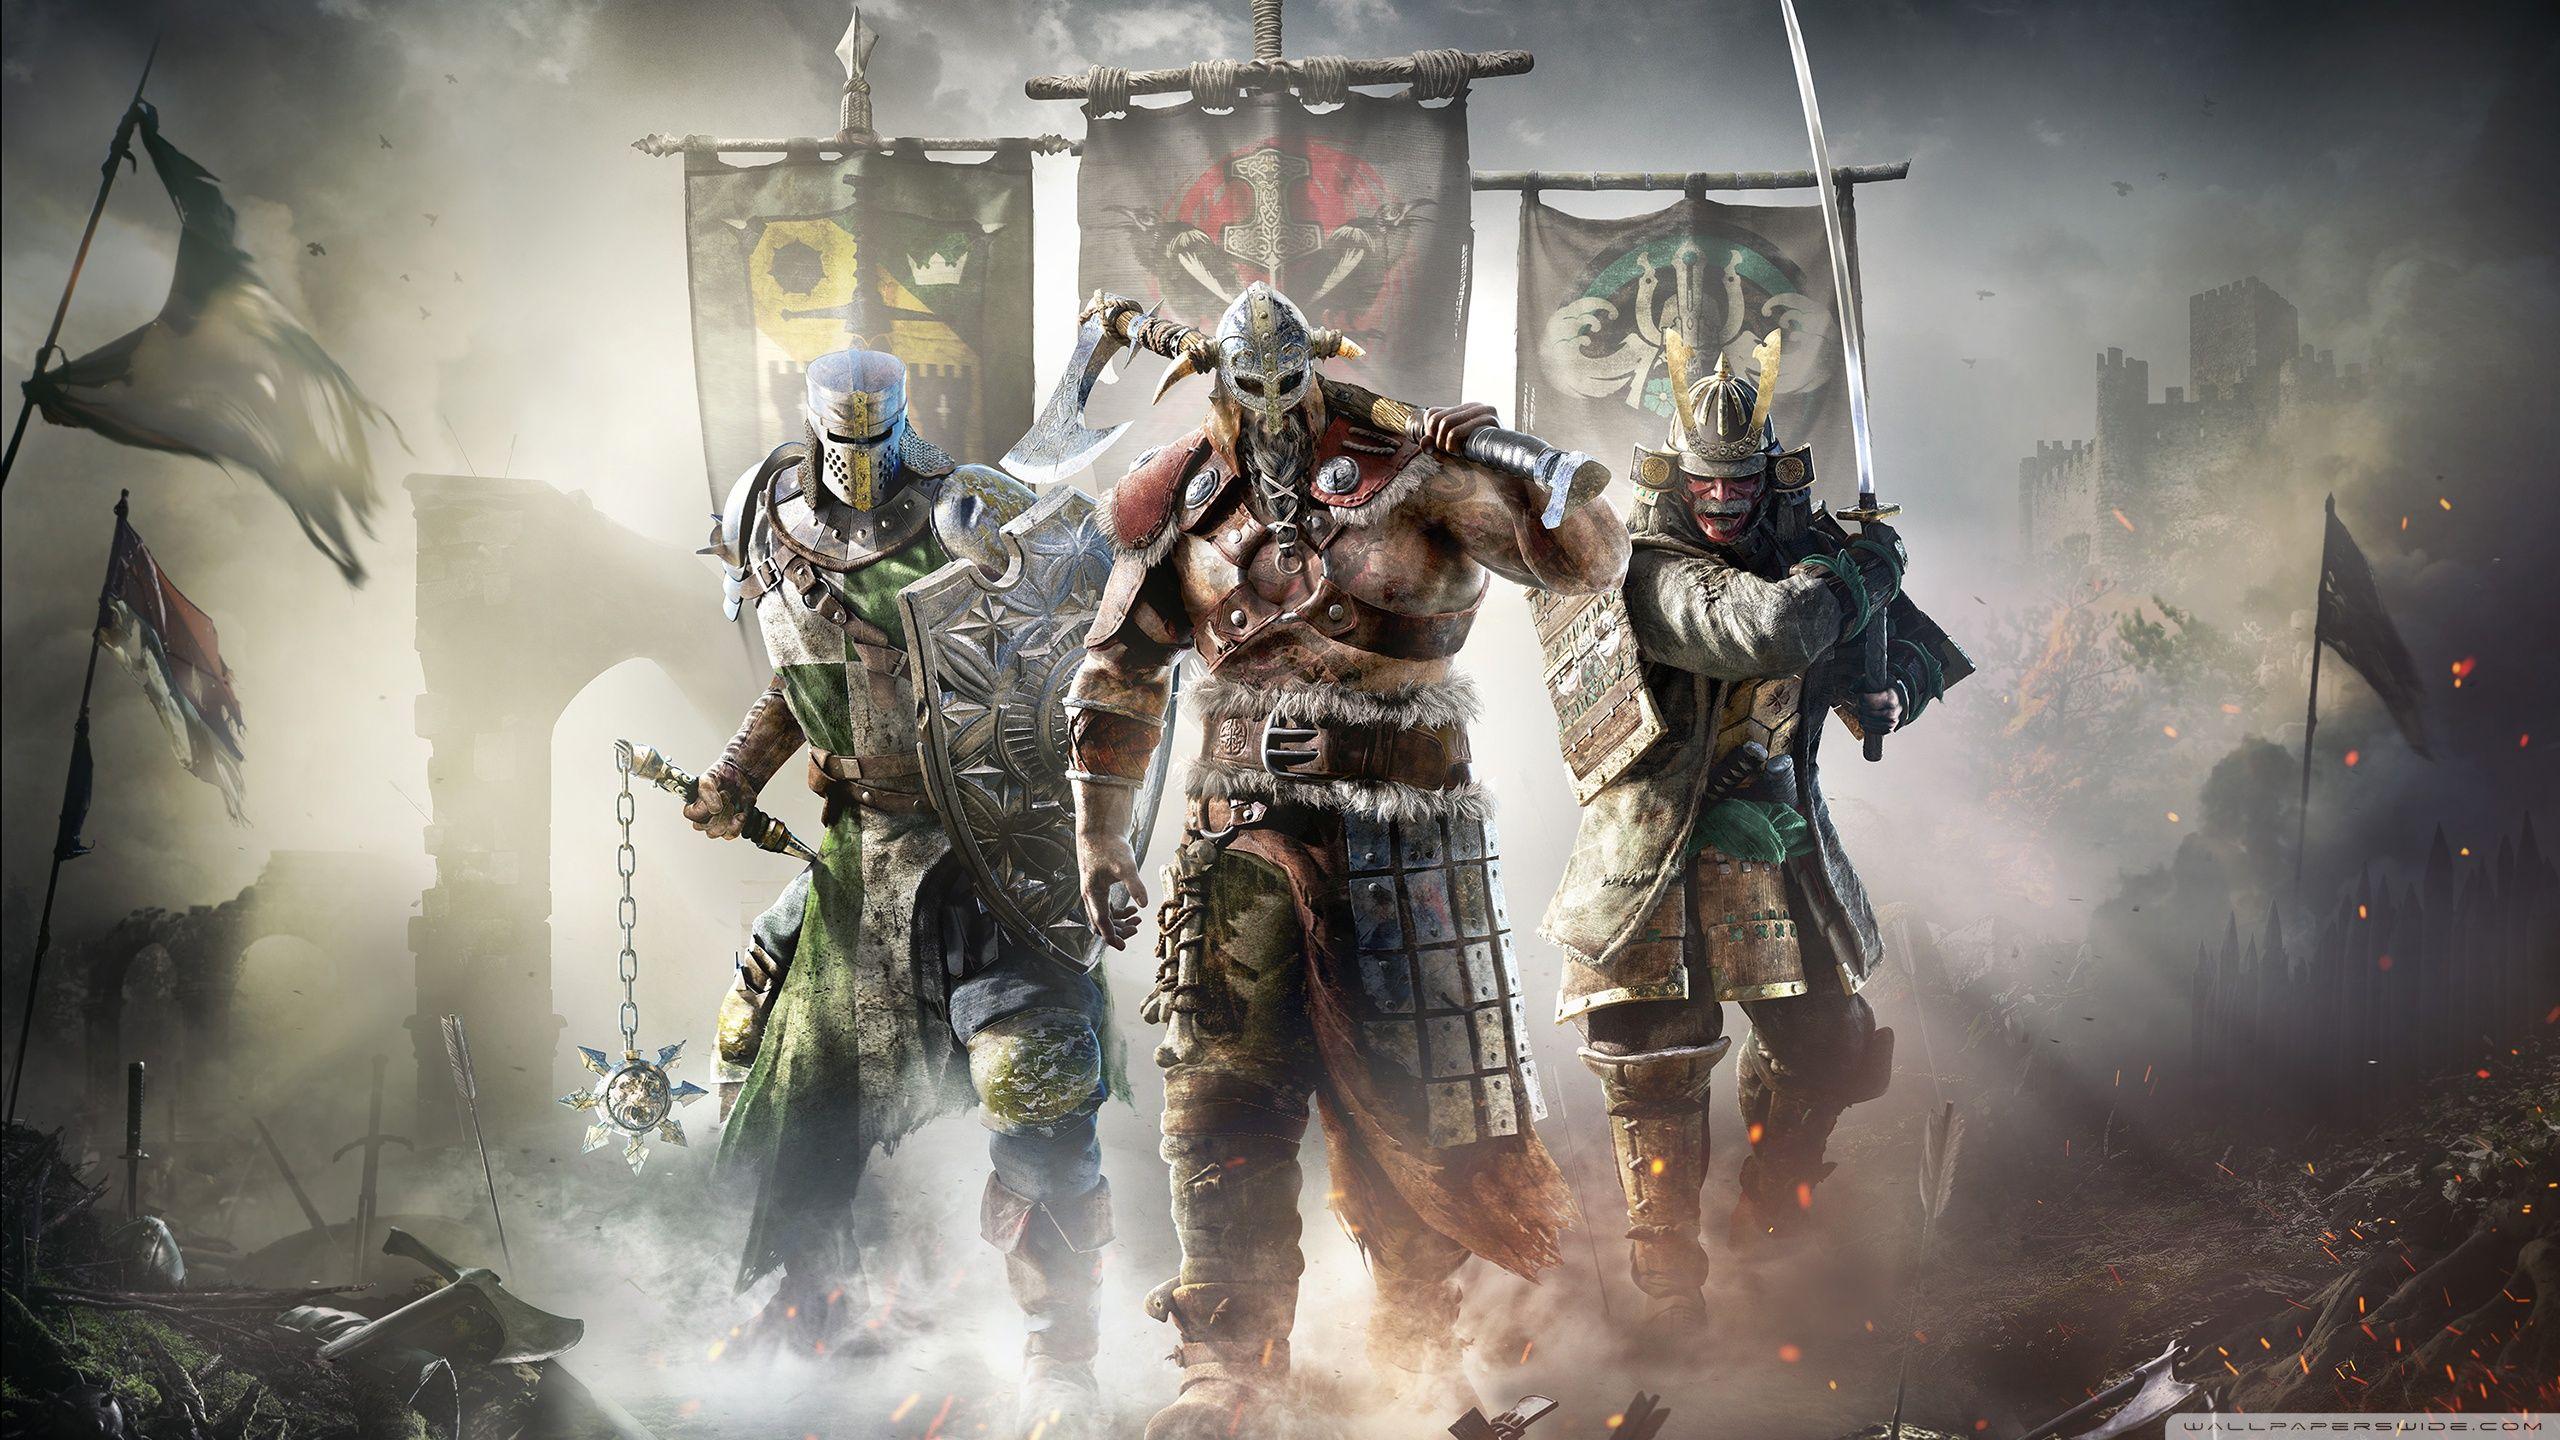 for honor warriors hd desktop wallpaper widescreen fullscreen